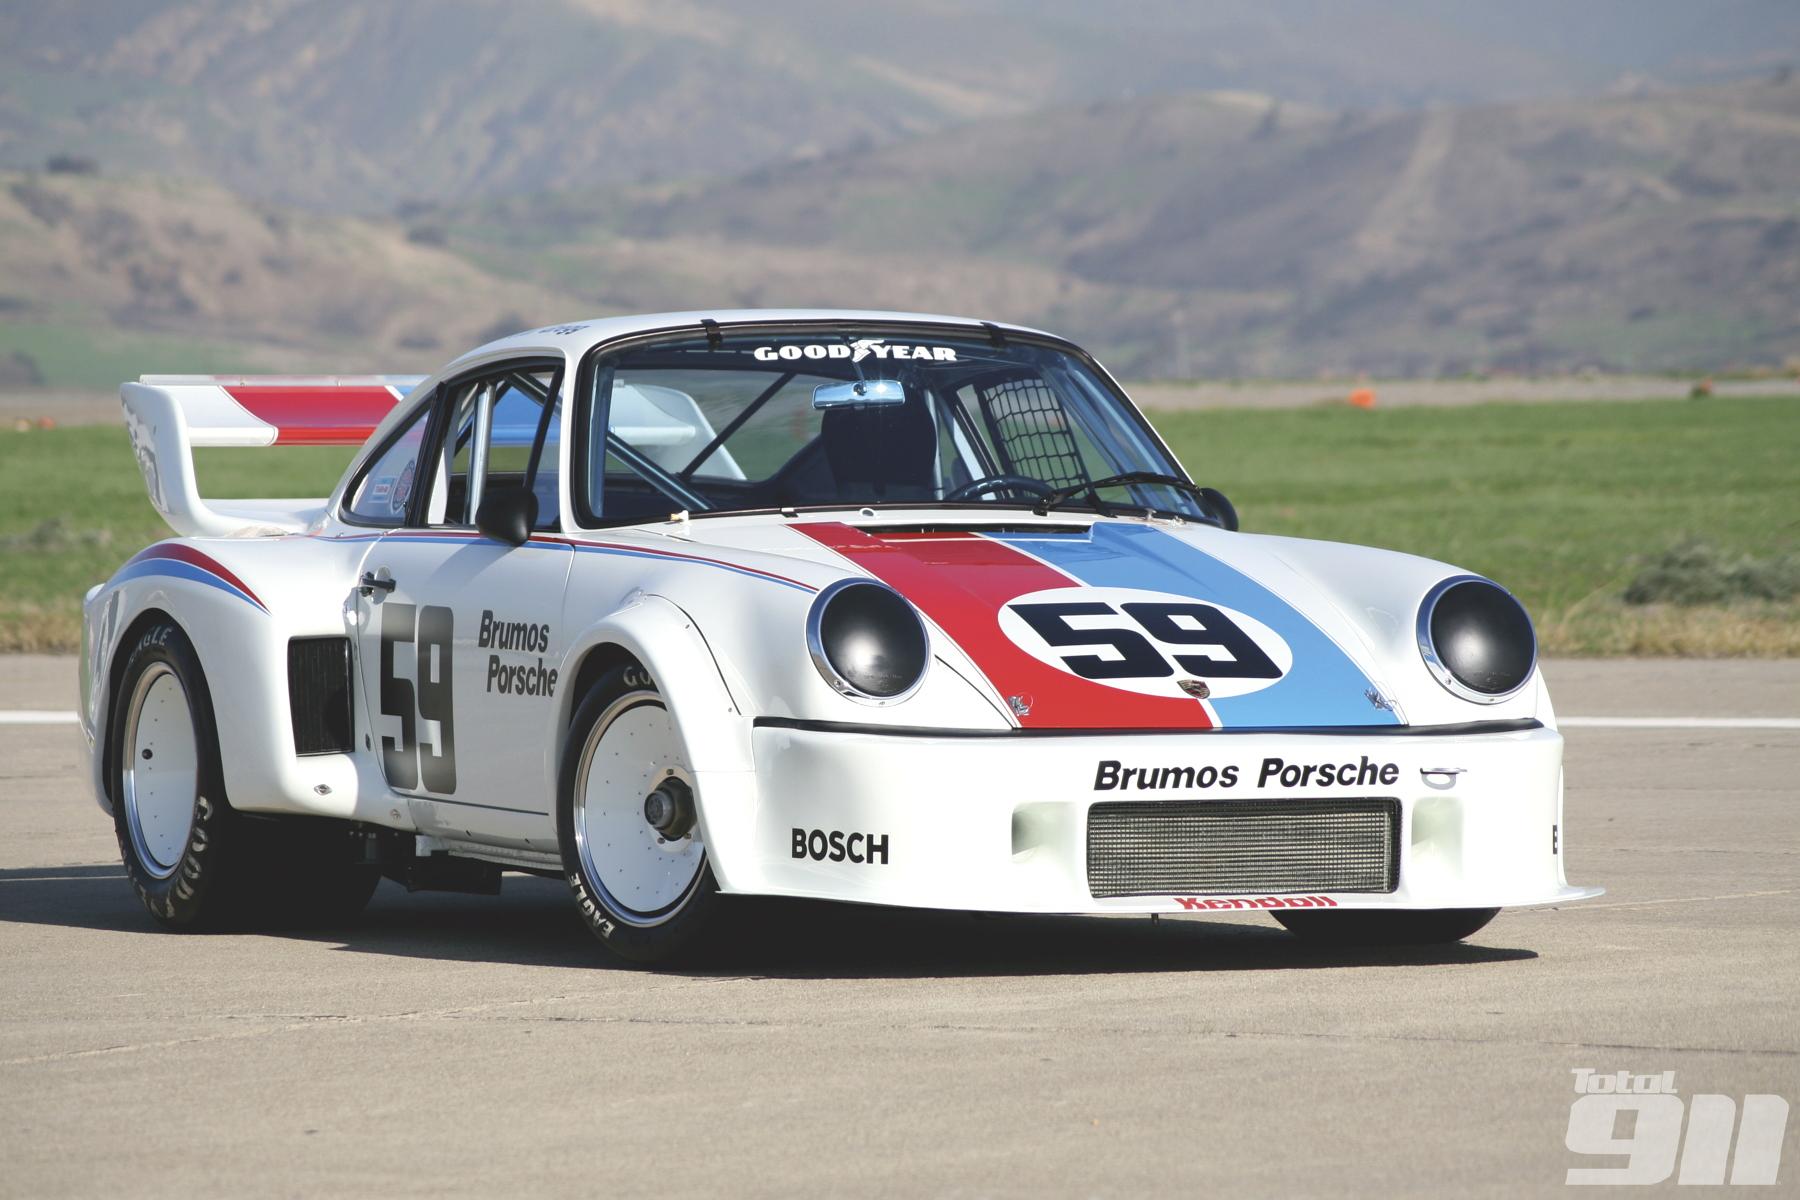 Blue Colour Car Wallpaper Seven Classic Porsche Racing Liveries That Will Make You